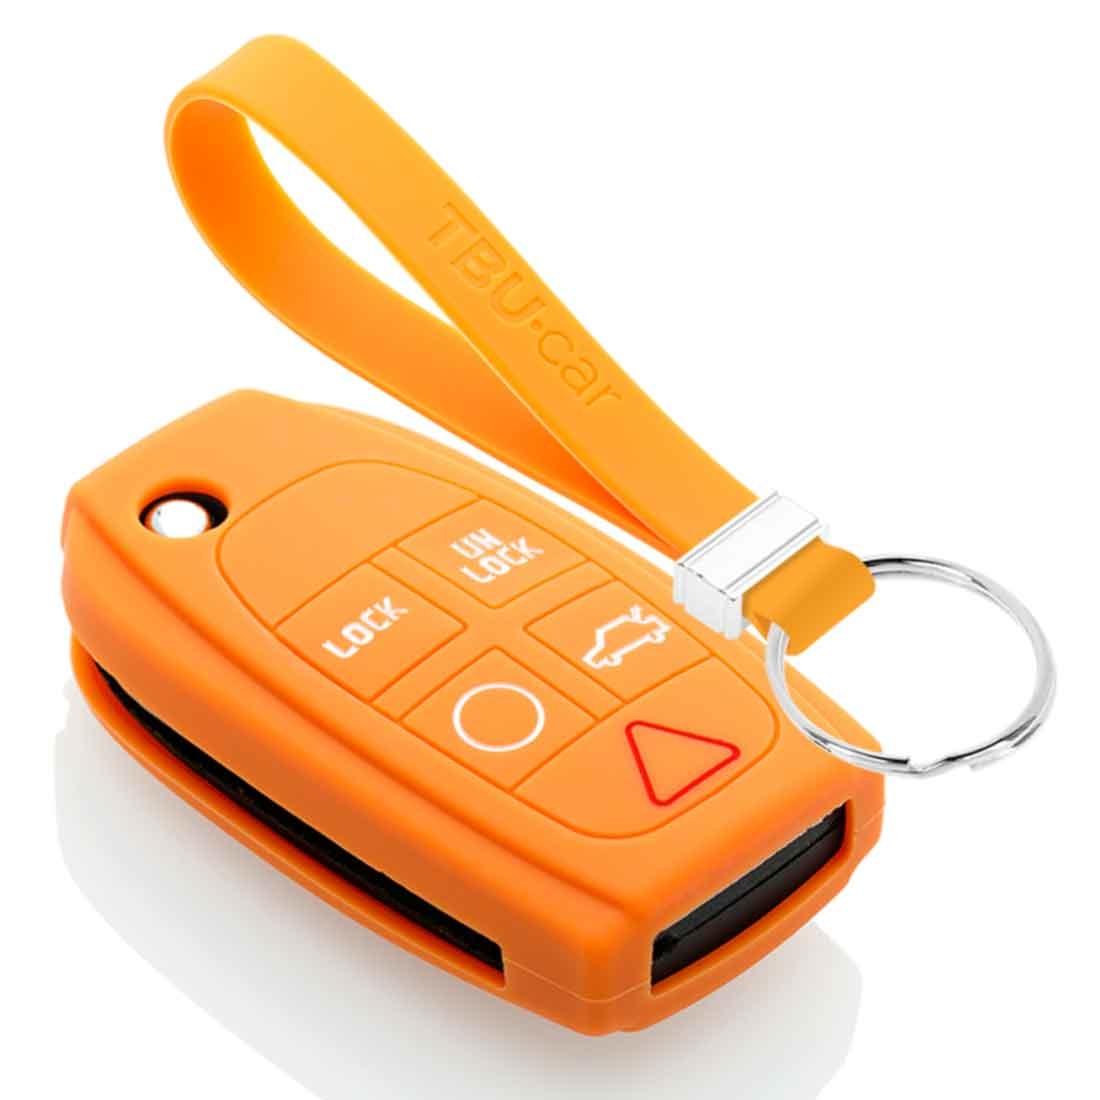 TBU car TBU car Sleutel cover compatibel met Volvo - Silicone sleutelhoesje - beschermhoesje autosleutel - Oranje